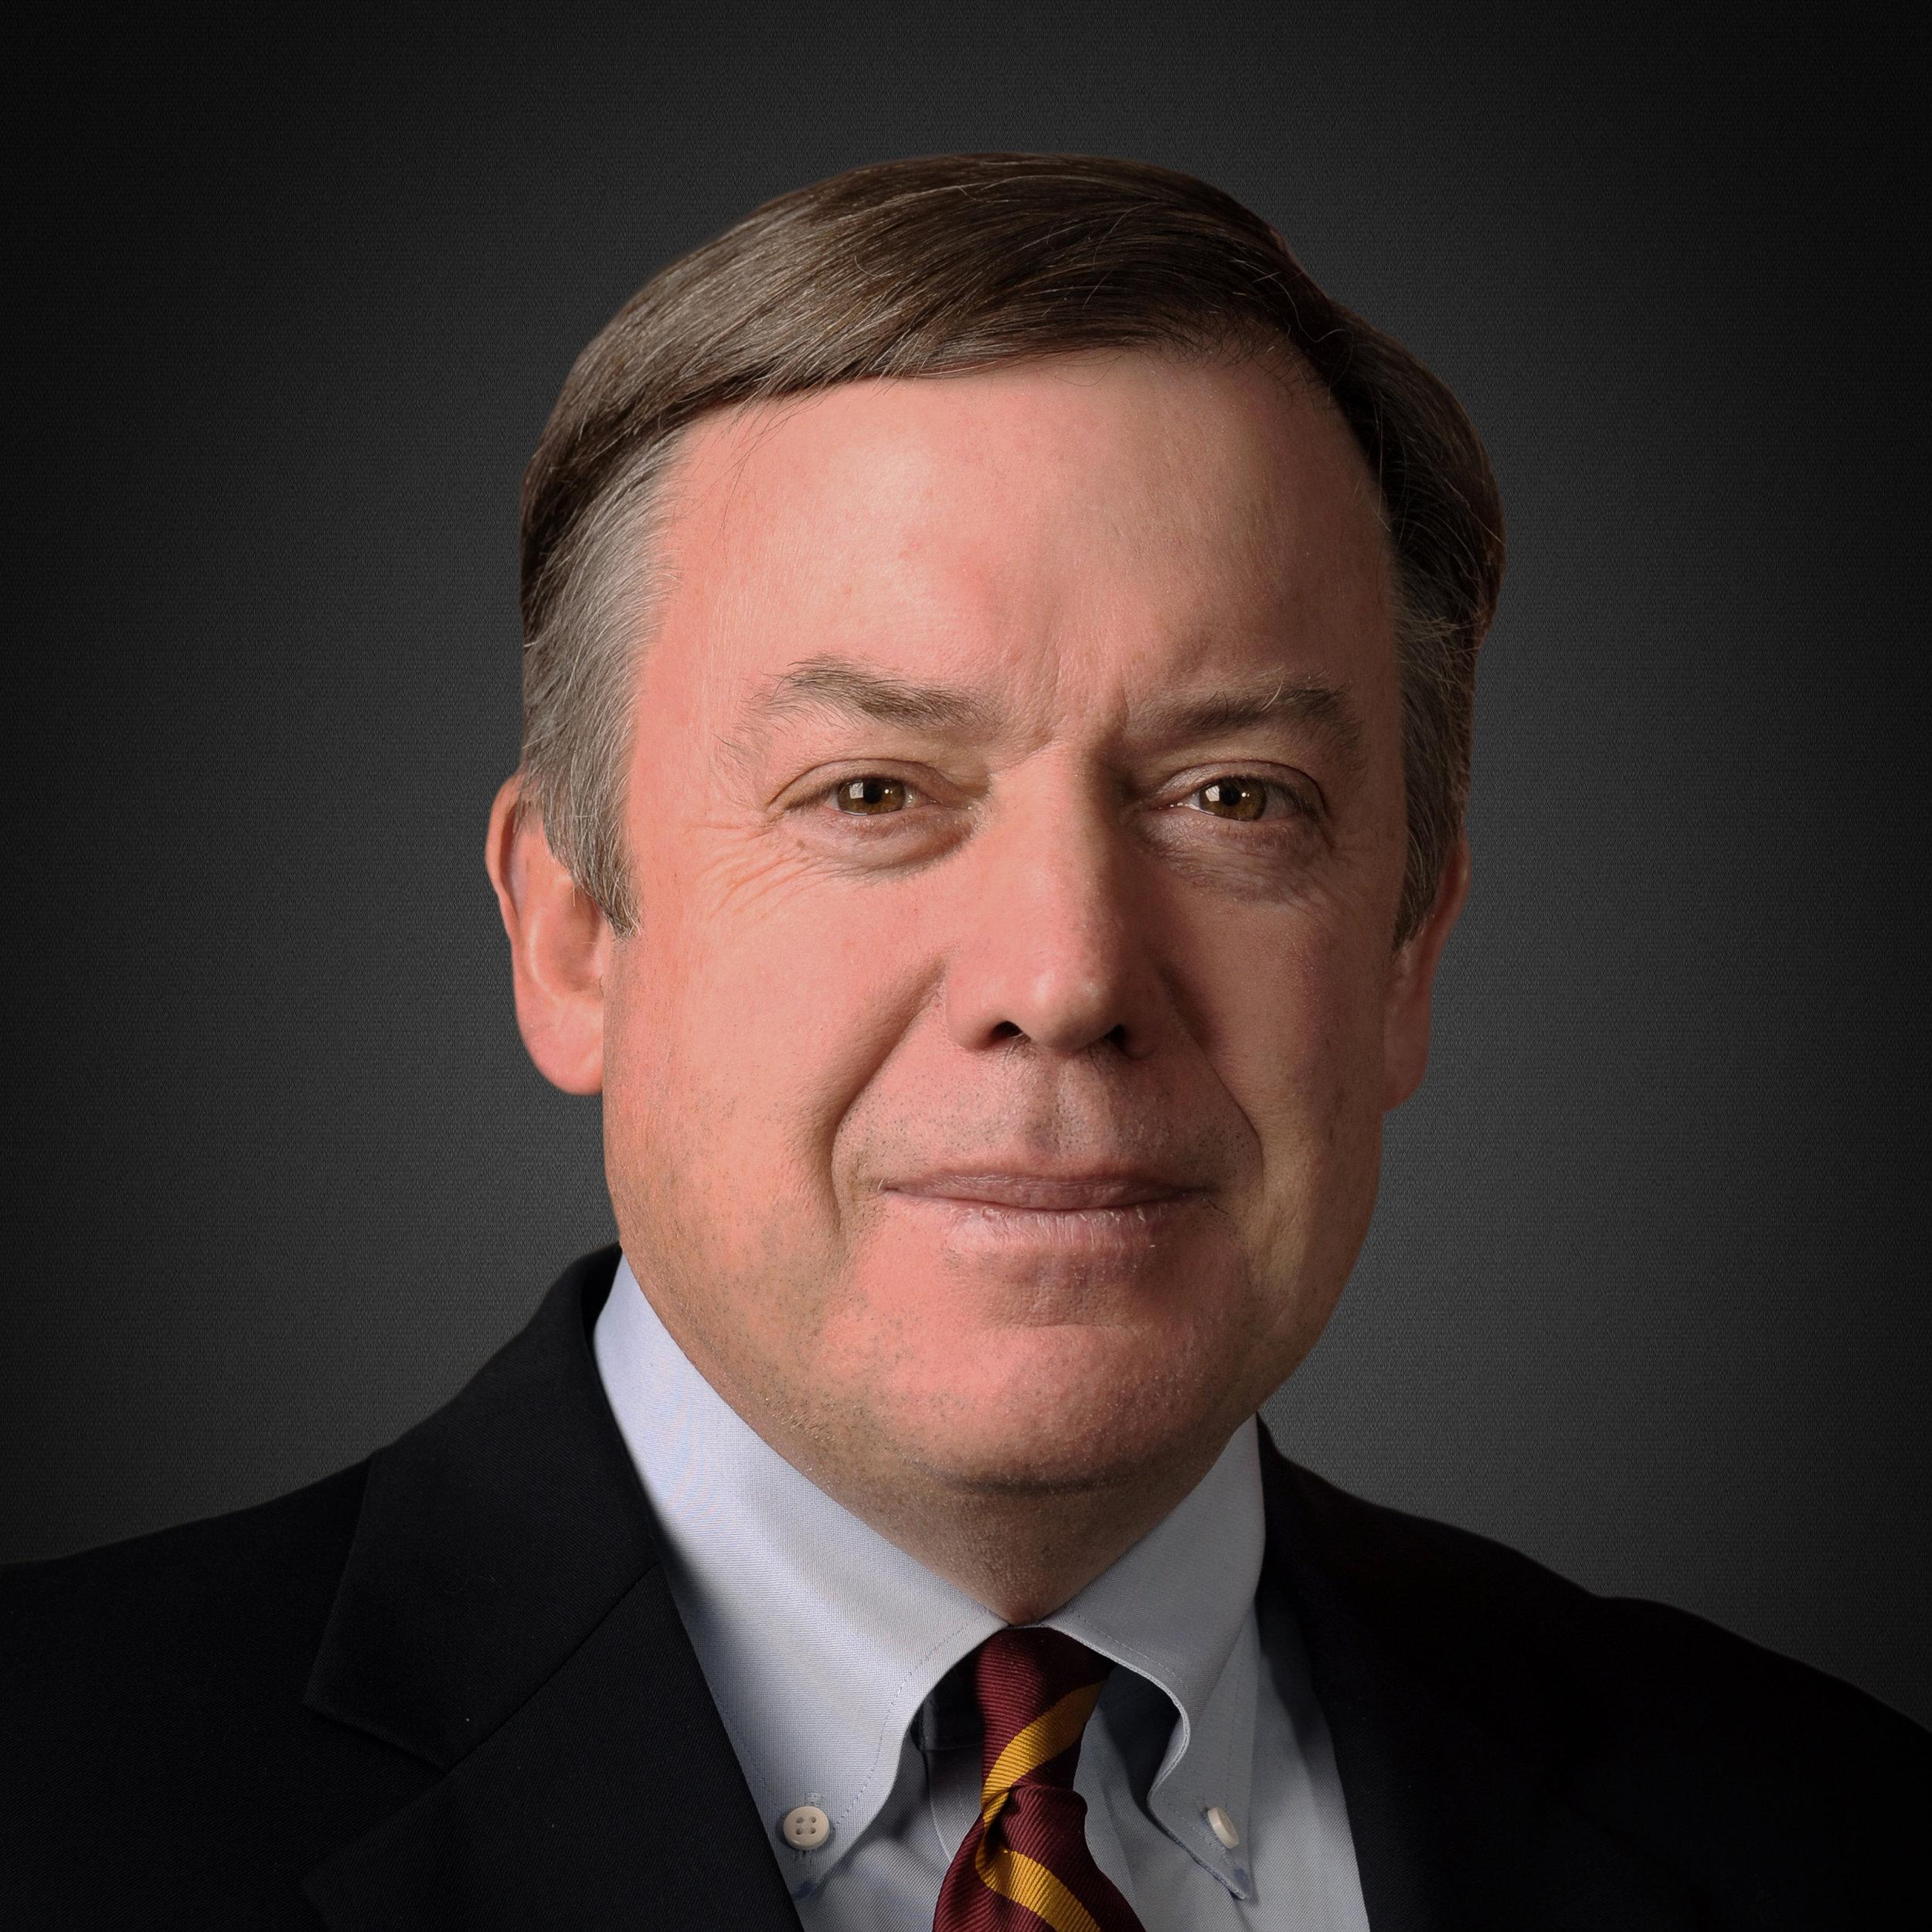 Dr. Michael Crow Senior Advisor, Education